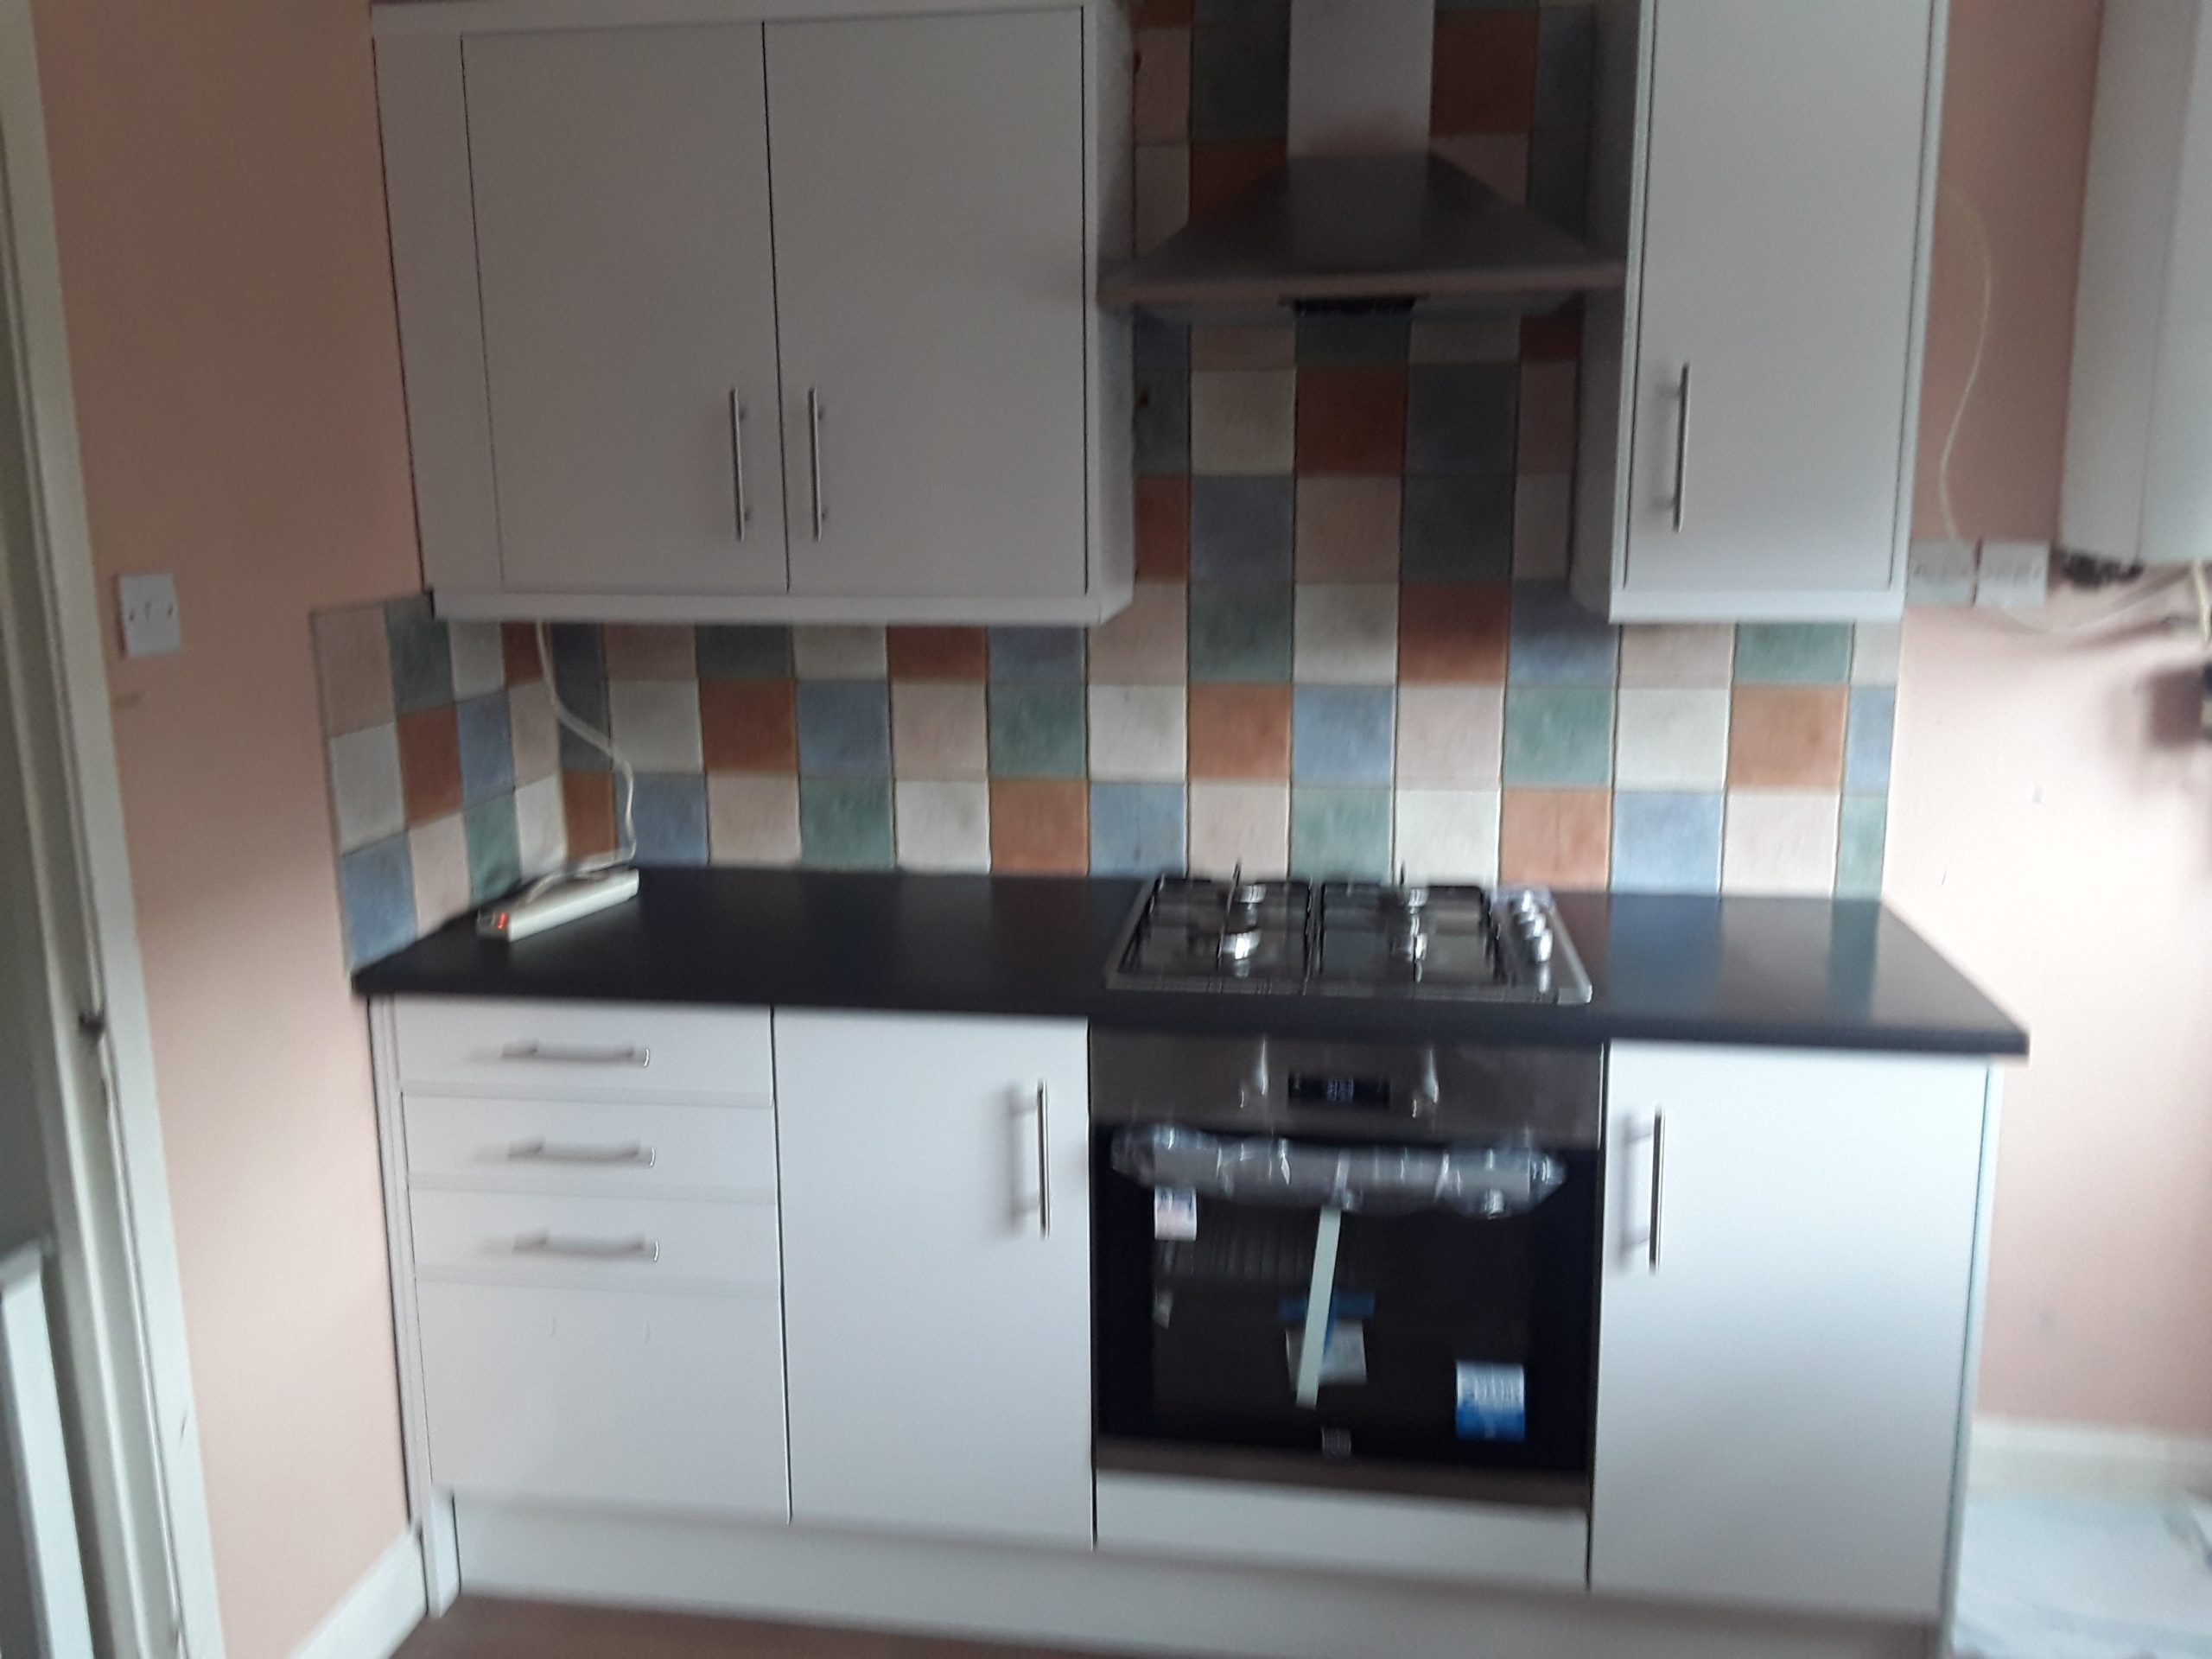 Kitchen at Lingey Close